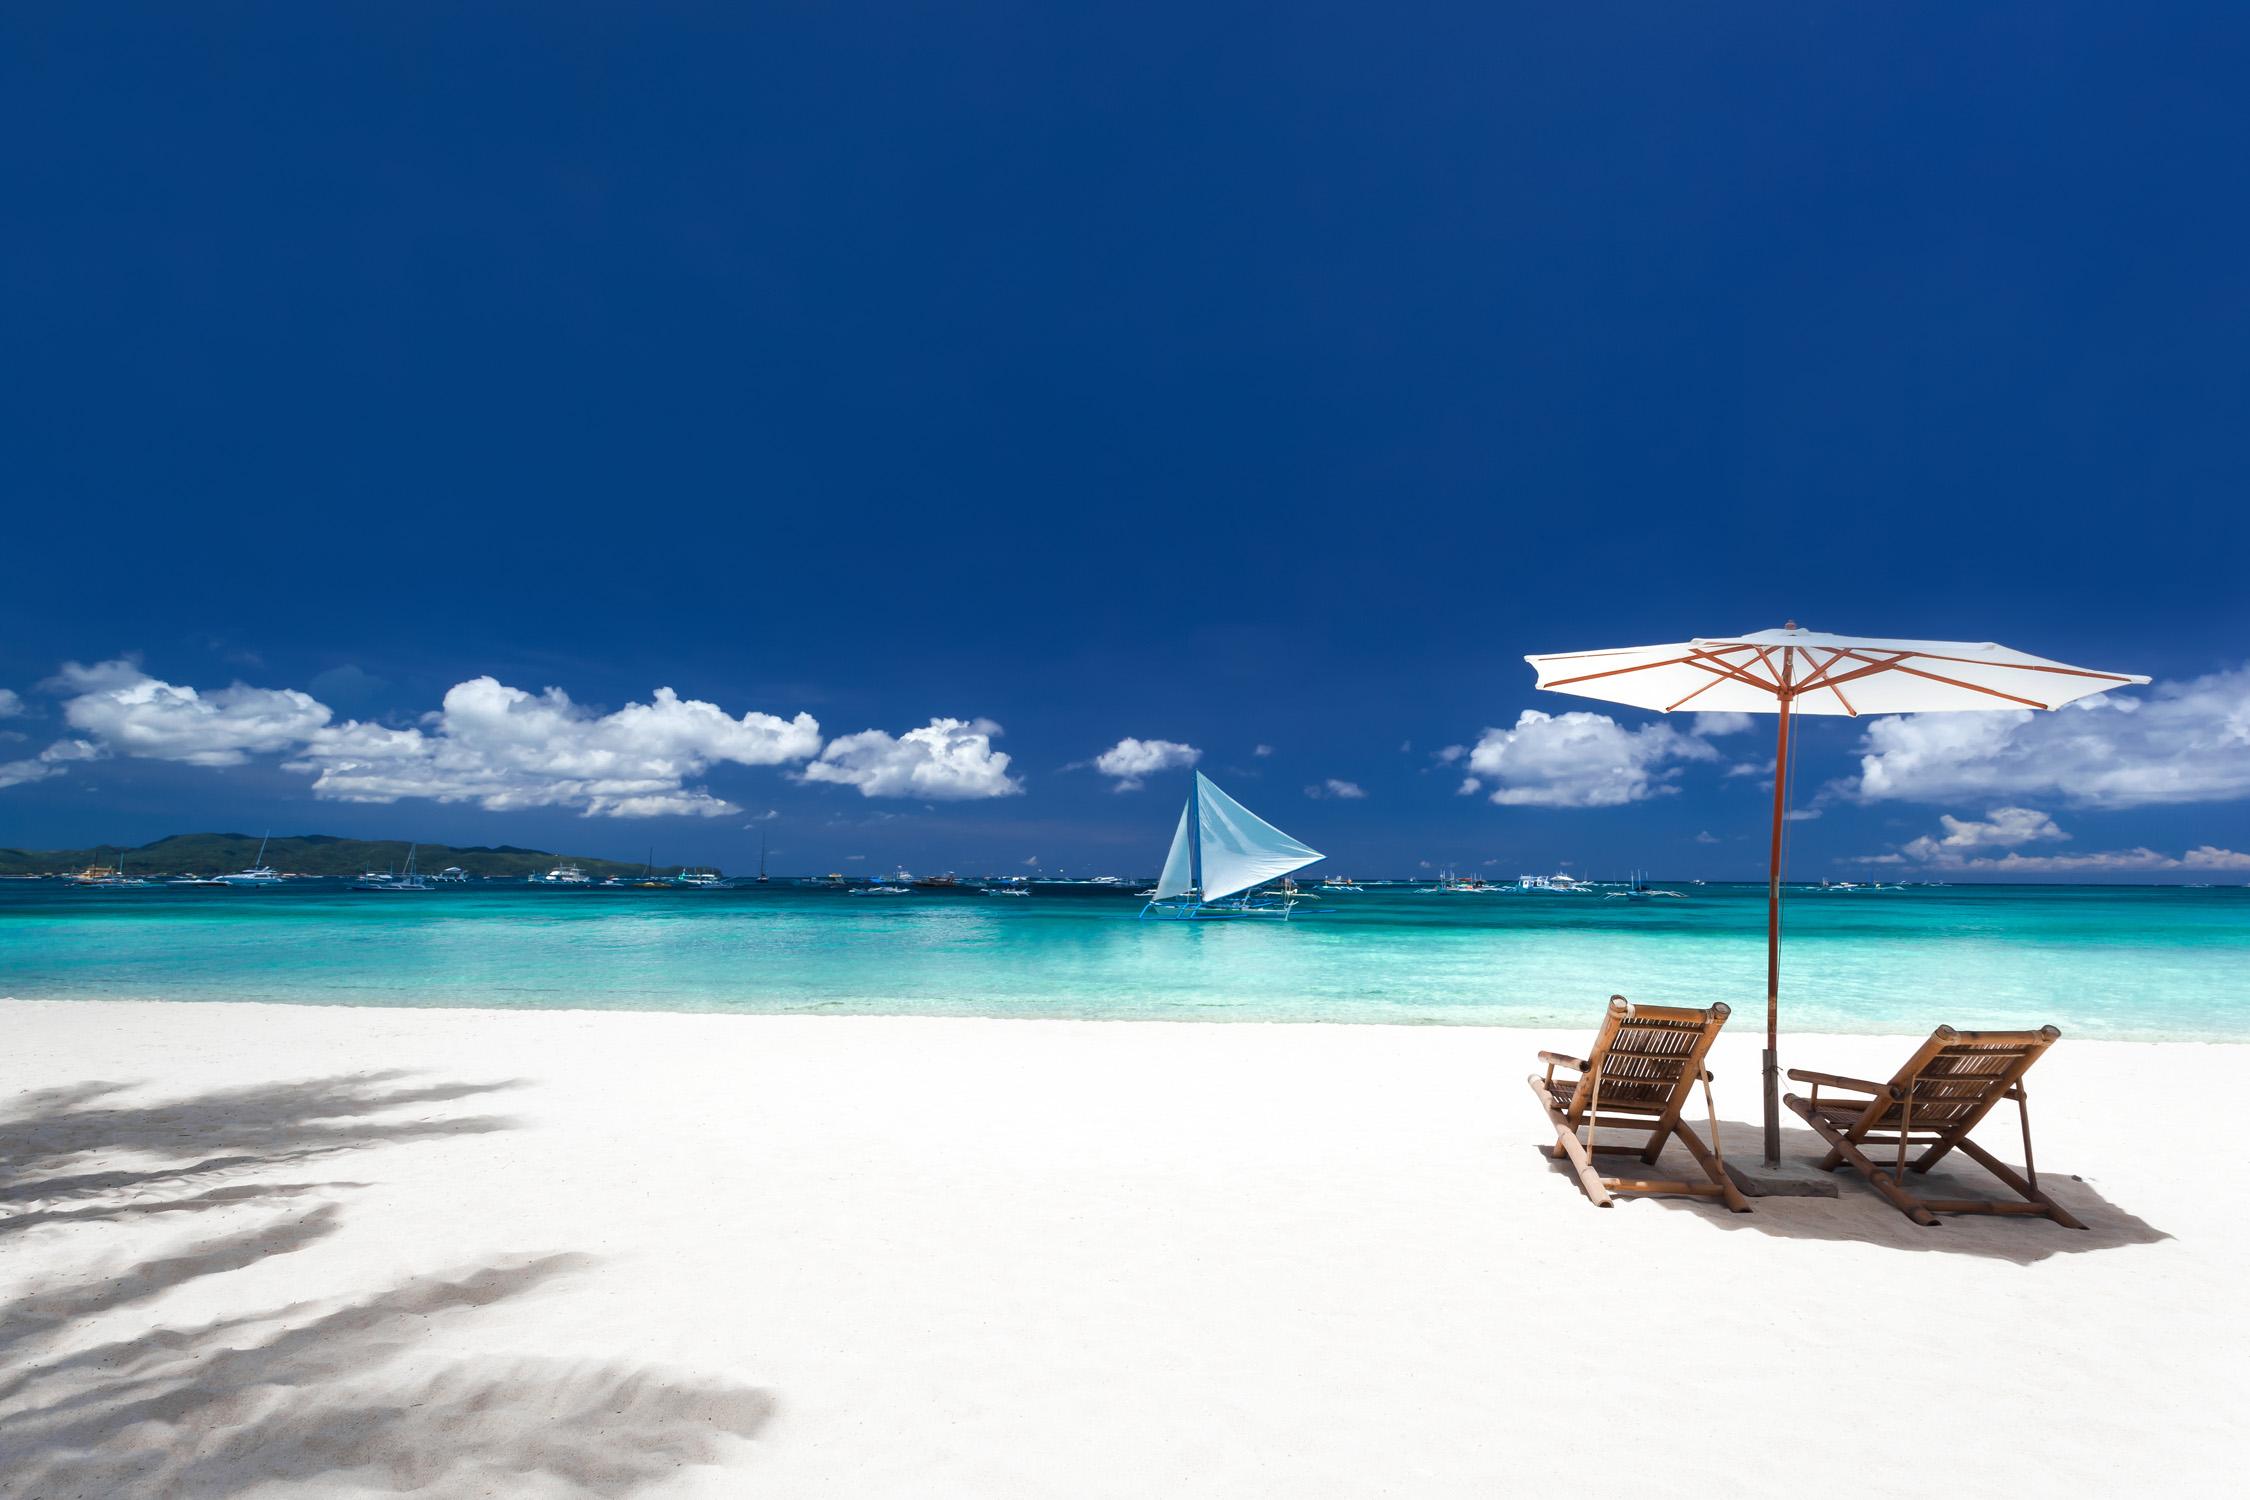 carribbean dream 13 tage auf den bahamas im guten 3 5. Black Bedroom Furniture Sets. Home Design Ideas